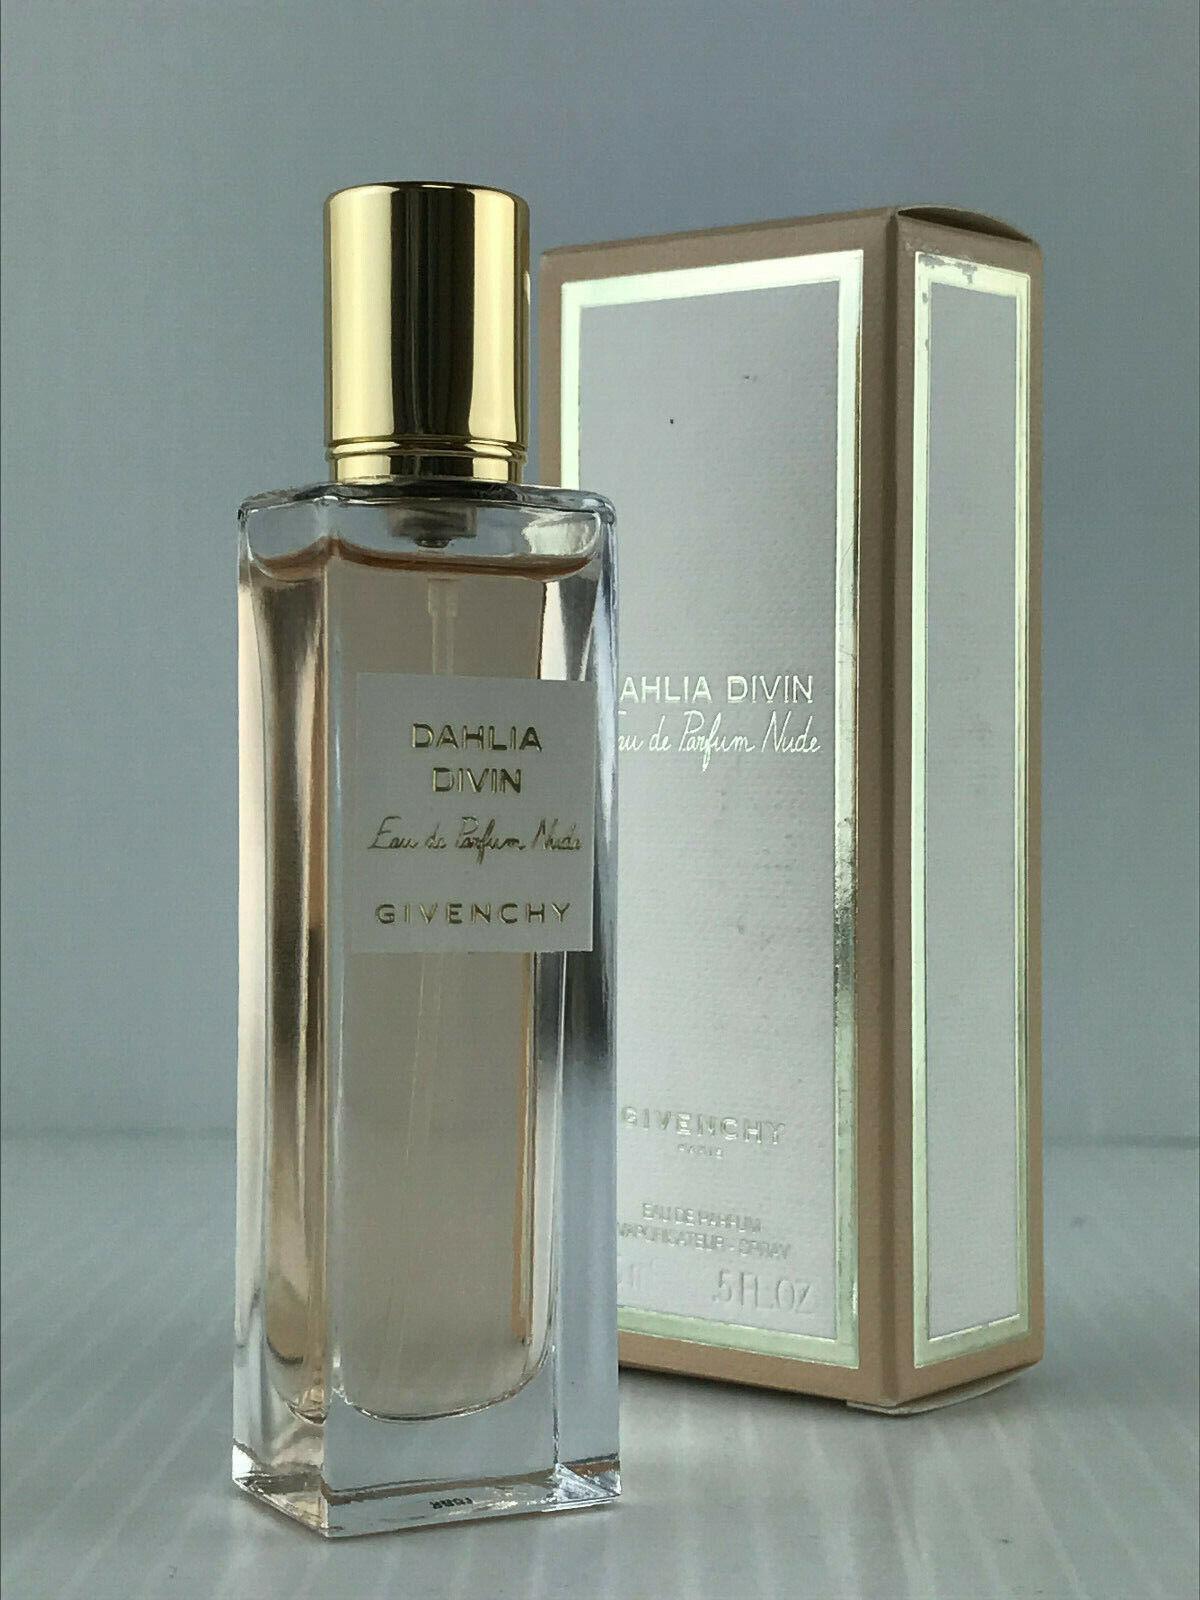 Dahlia Divin Nude by Givenchy MINI EDP Spray 0.5 oz/15 ml